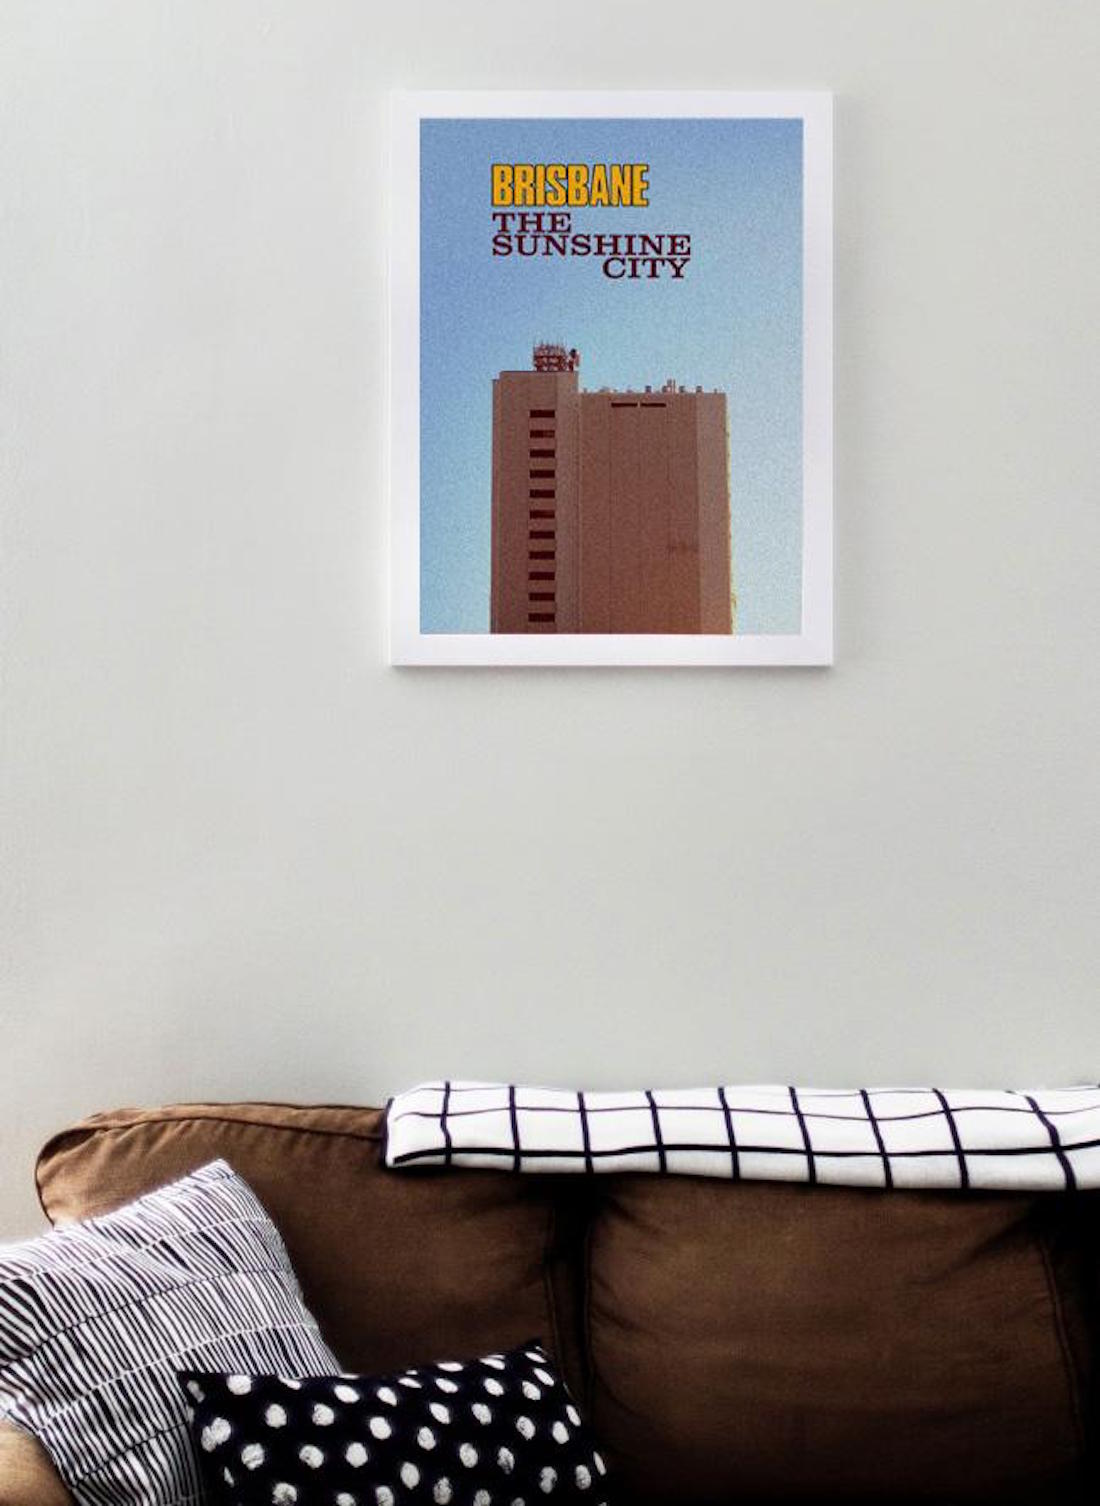 A Brisbane City poster hangs a wall.